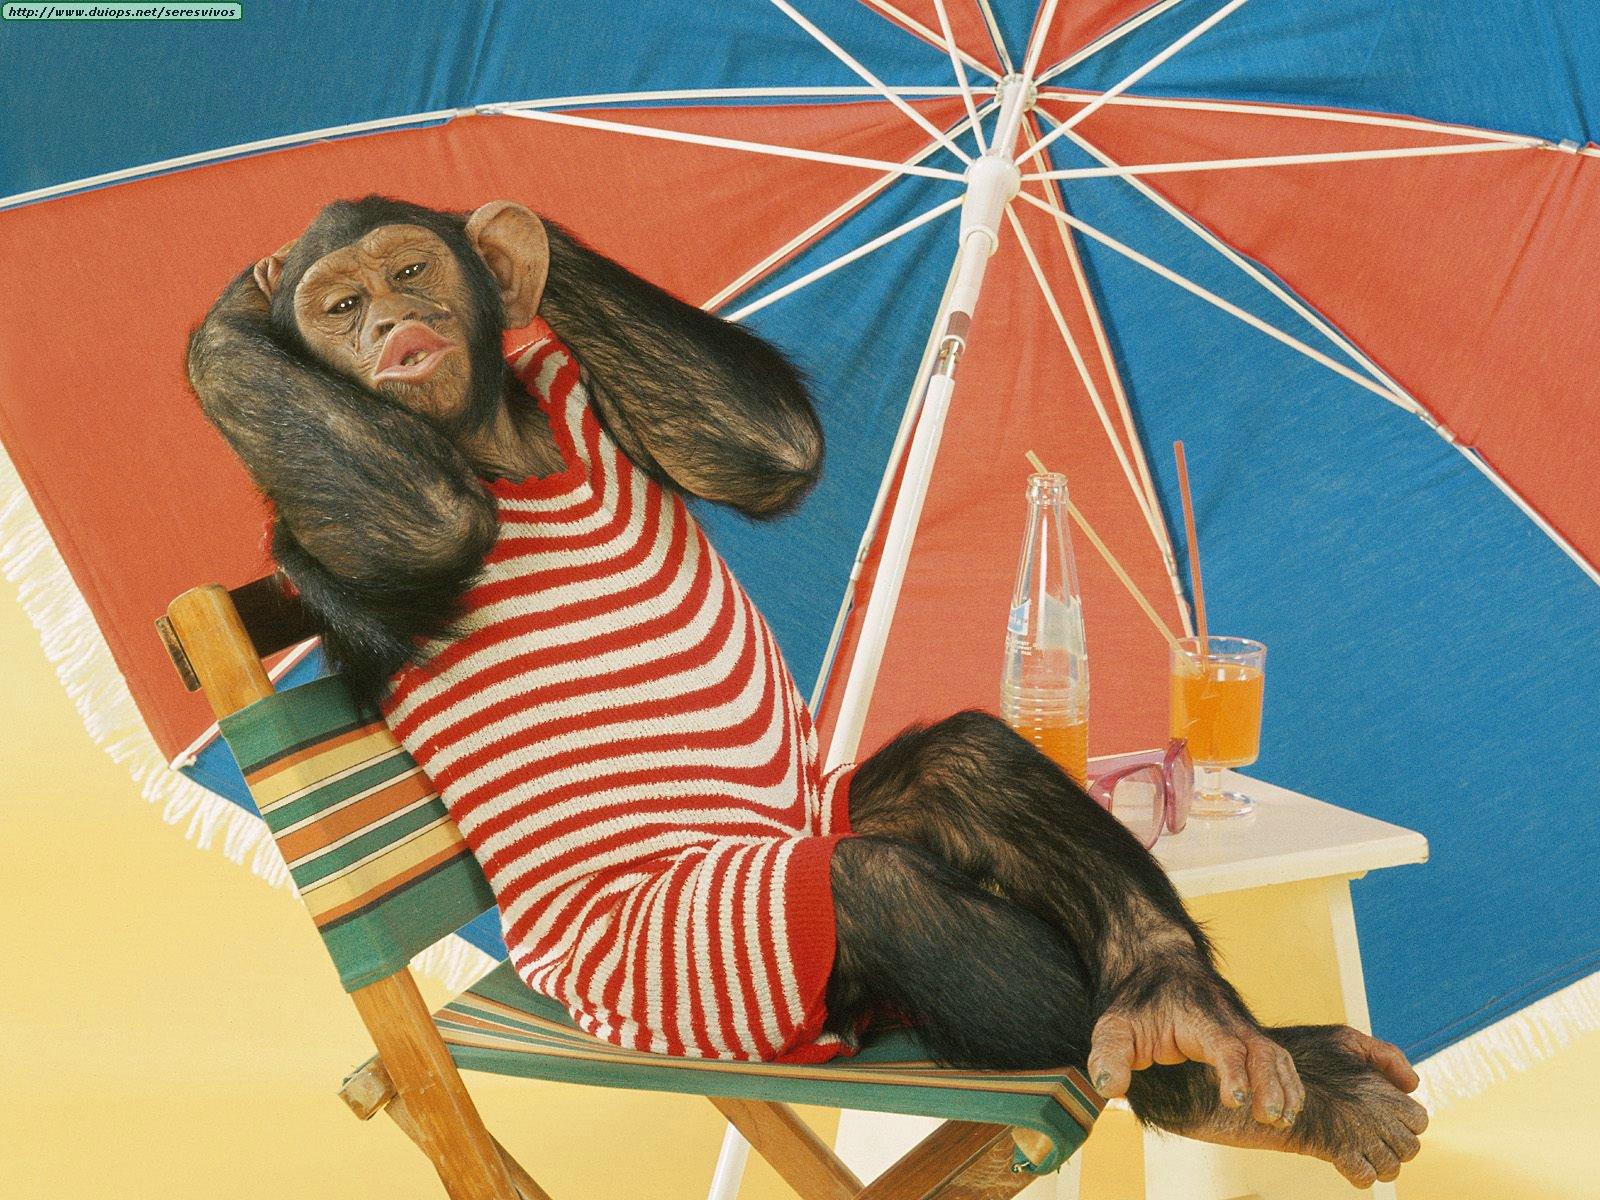 Funny summer animals newbest photos wallpapers 2013 for Immagini divertenti desktop